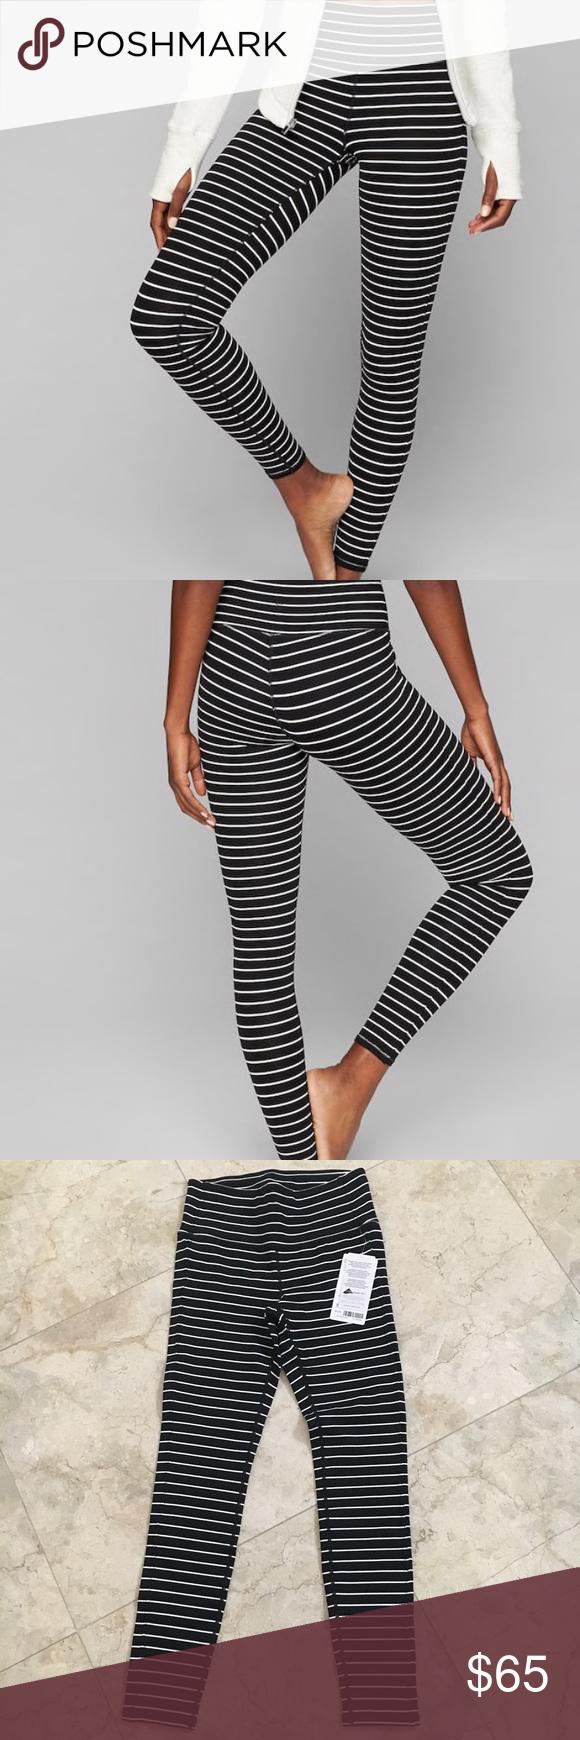 e7b965159e3a3 Athleta High Rise Stripe Chaturanga Tight Nwt Size SMALL, black and white  stripes , full length , high rise Athleta Pants Leggings